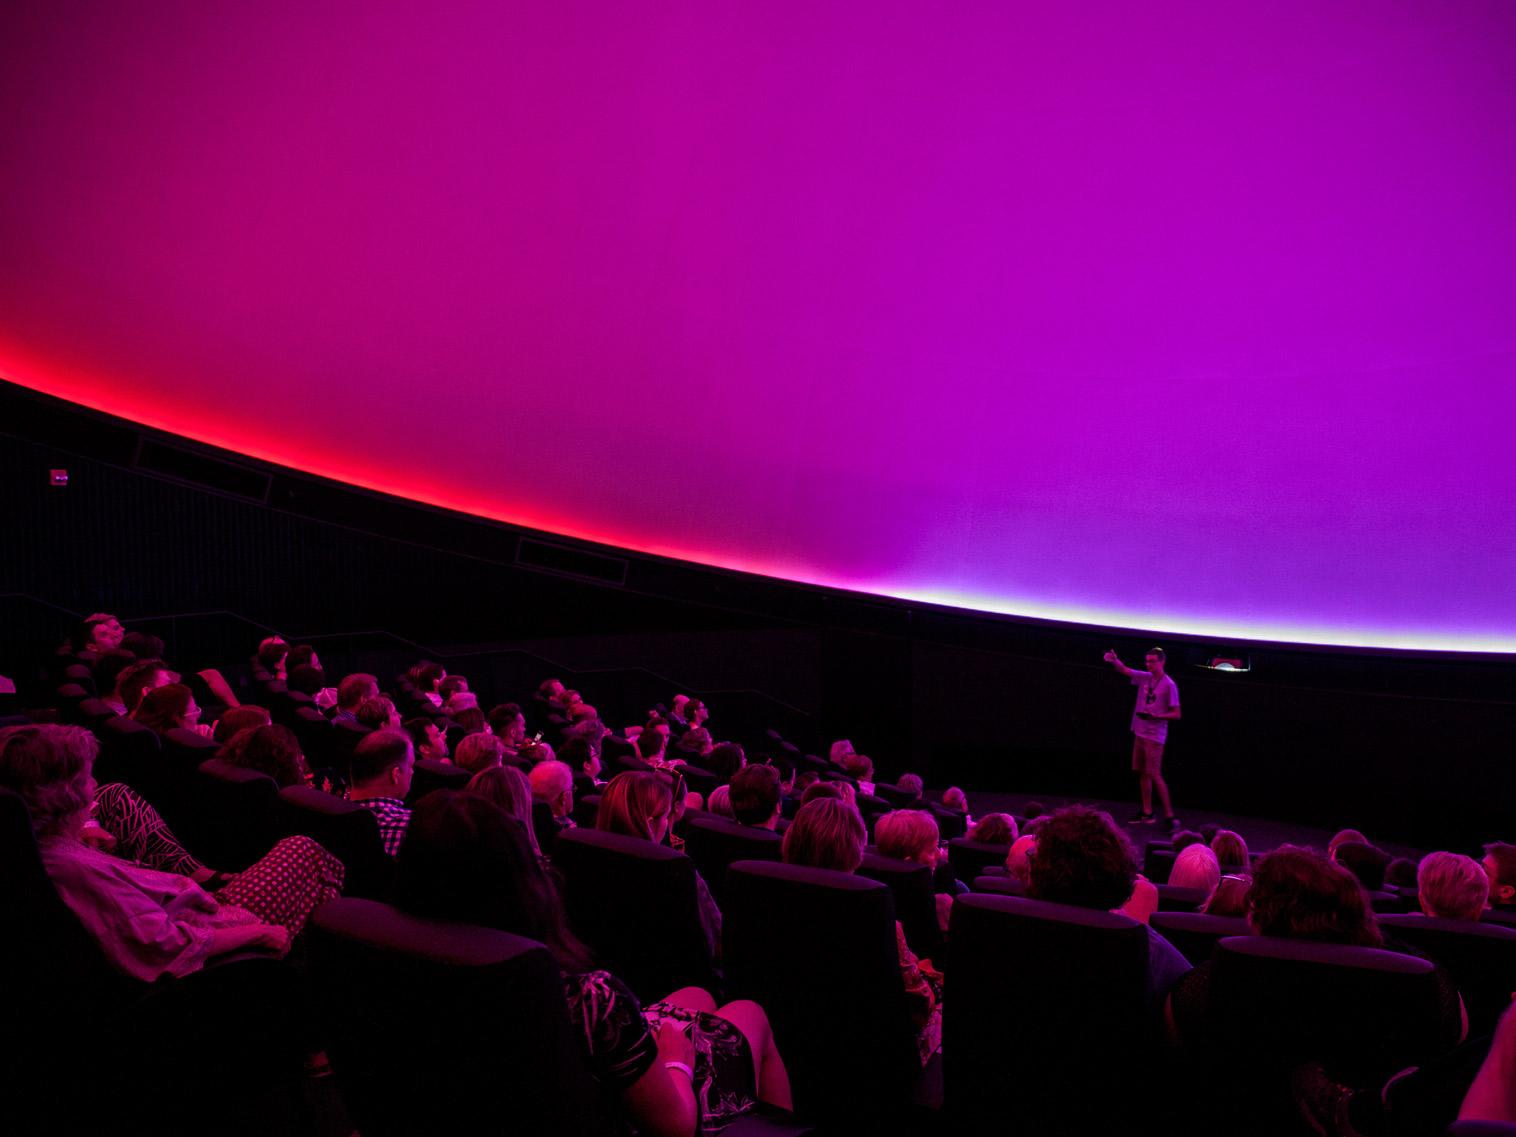 A planetarium audience listens to a presenter under magenta light